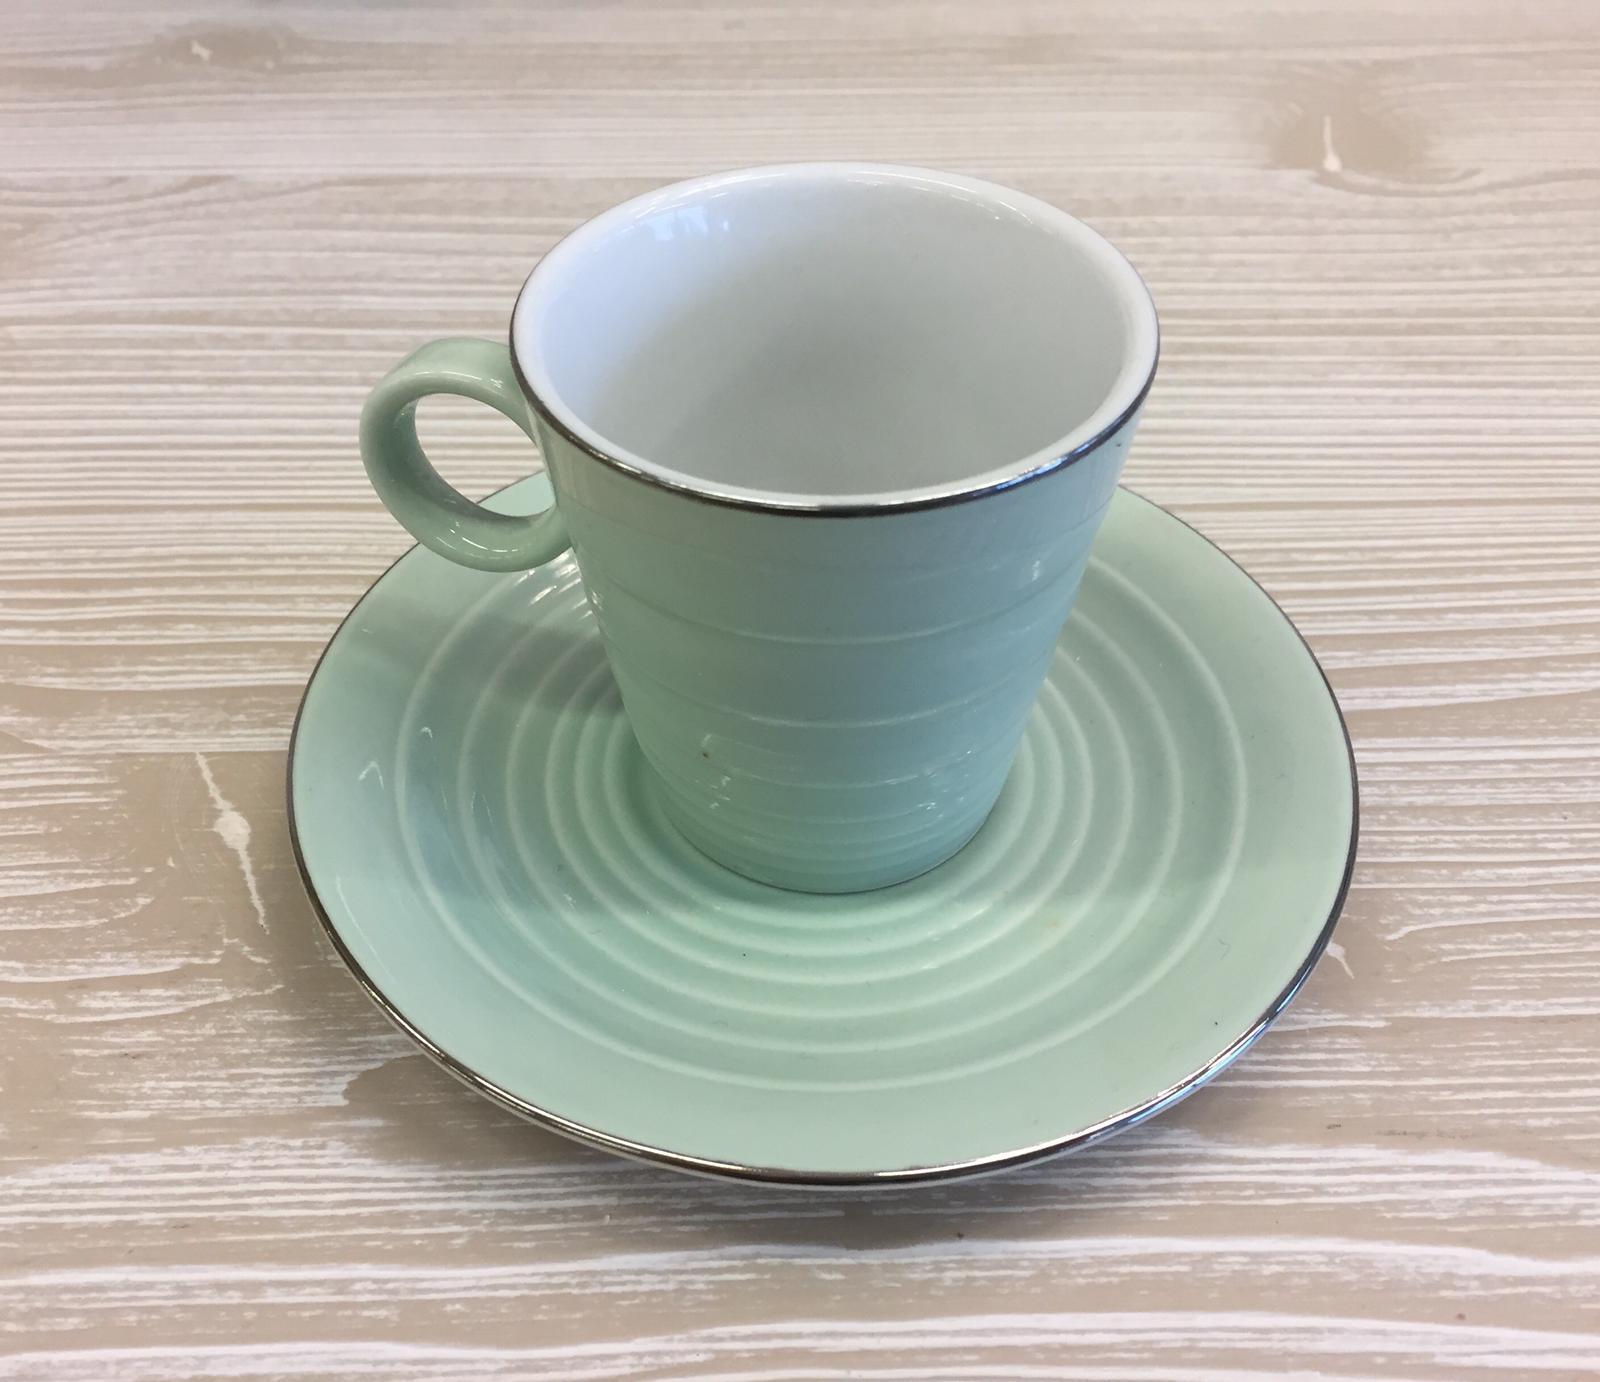 Set di 2 tazzine e 2 piattini verde menta